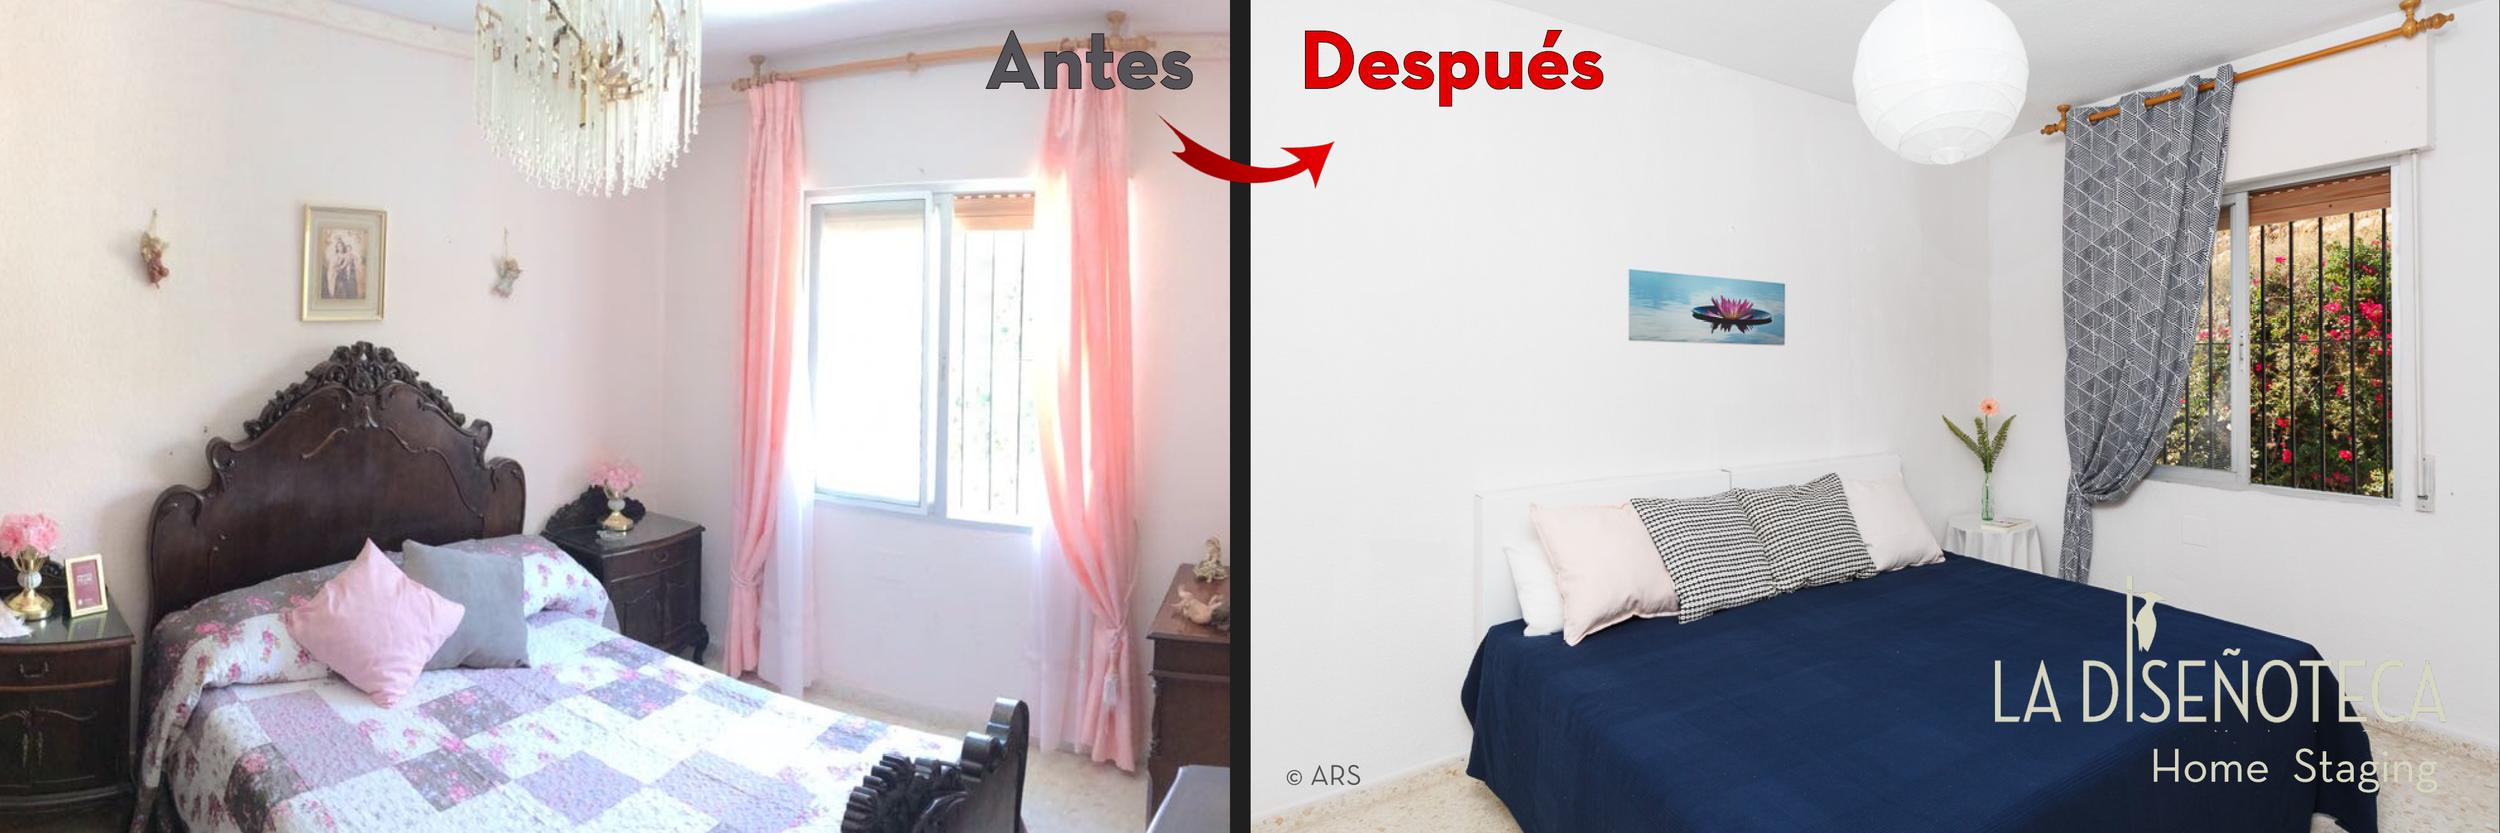 AntesyDespues Manuel Merino_dorm.png